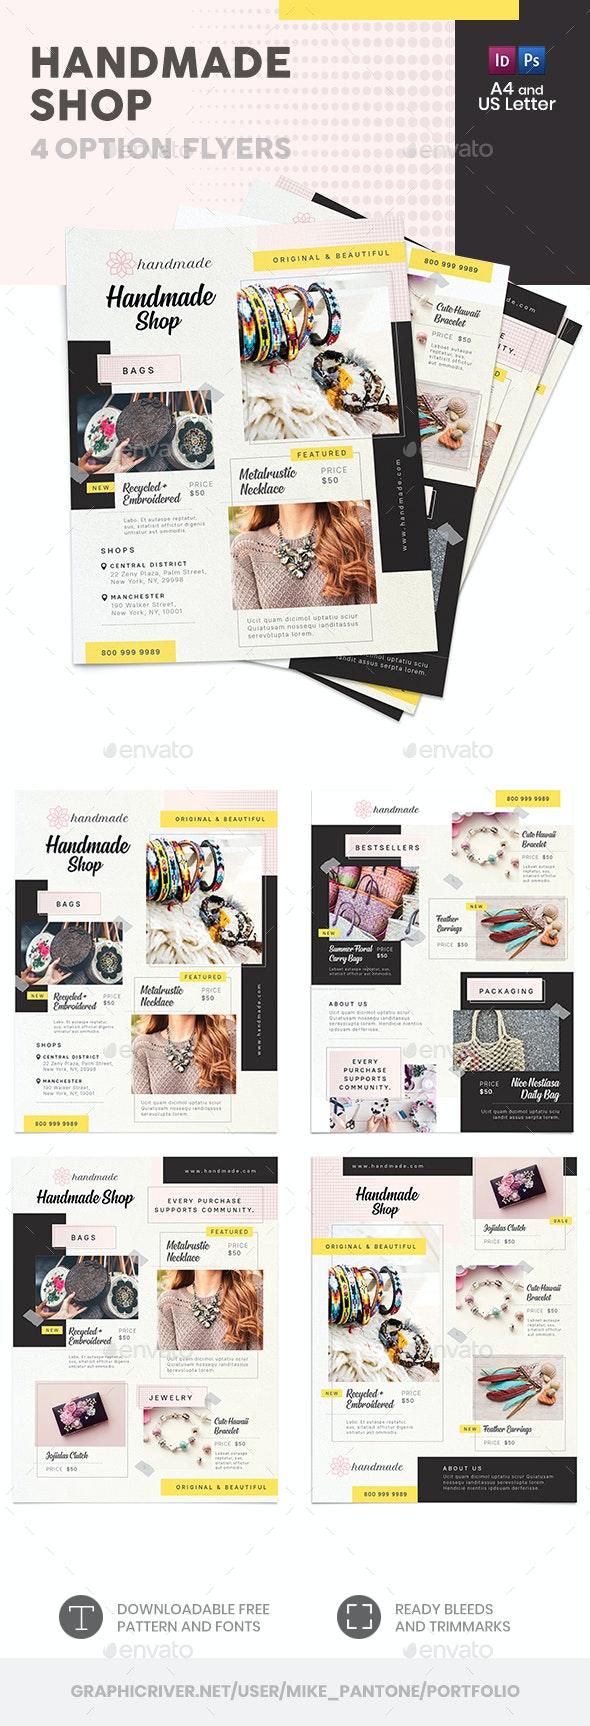 Handmade Shop Flyers 2 – 4 Options - Commerce Flyers